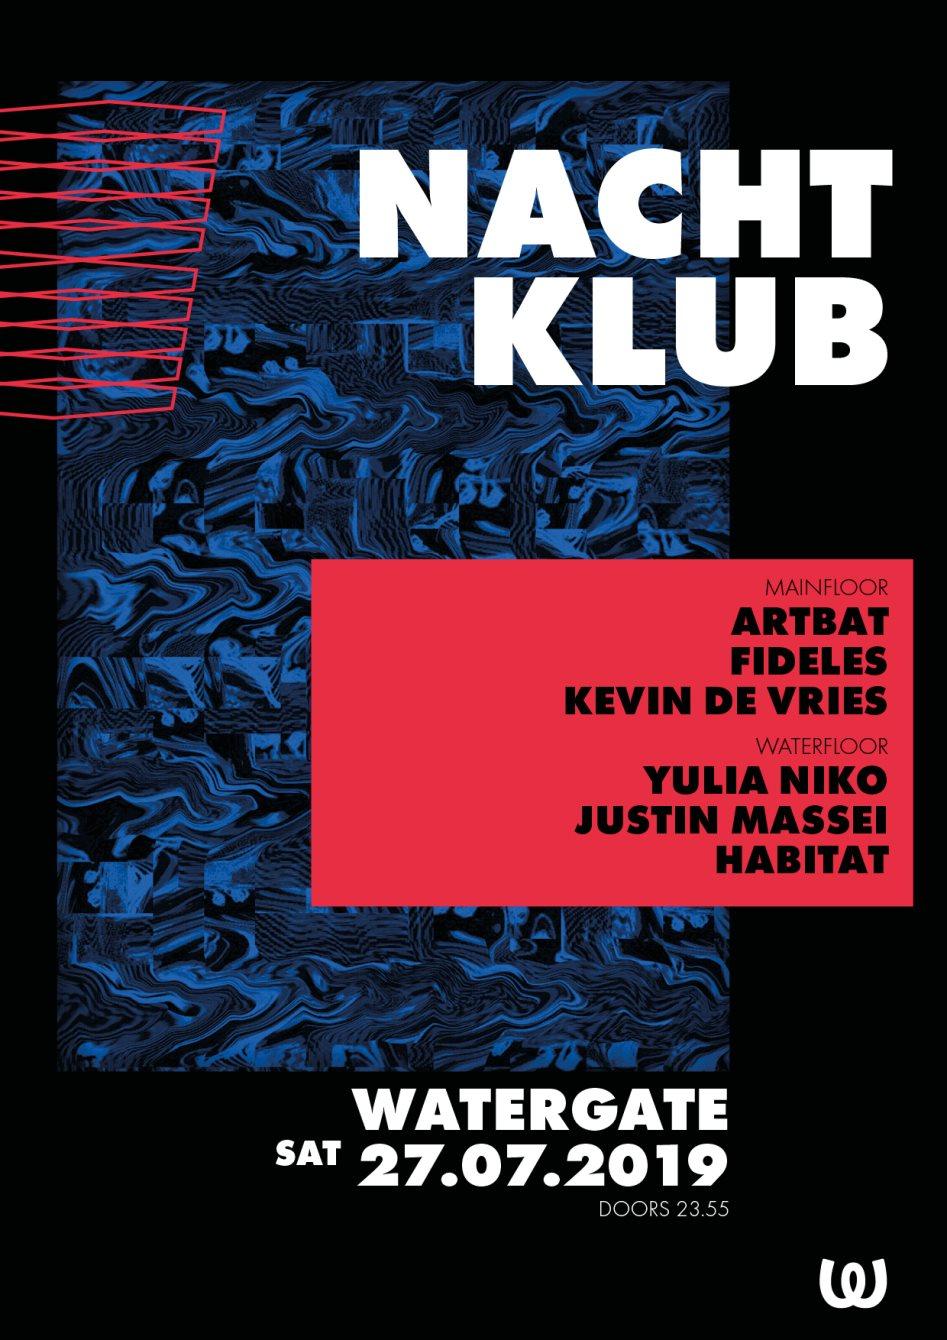 Nachtklub with Artbat, Fideles, Kevin de Vries, Yulia Niko, Justin Massei, Habitat - Flyer front